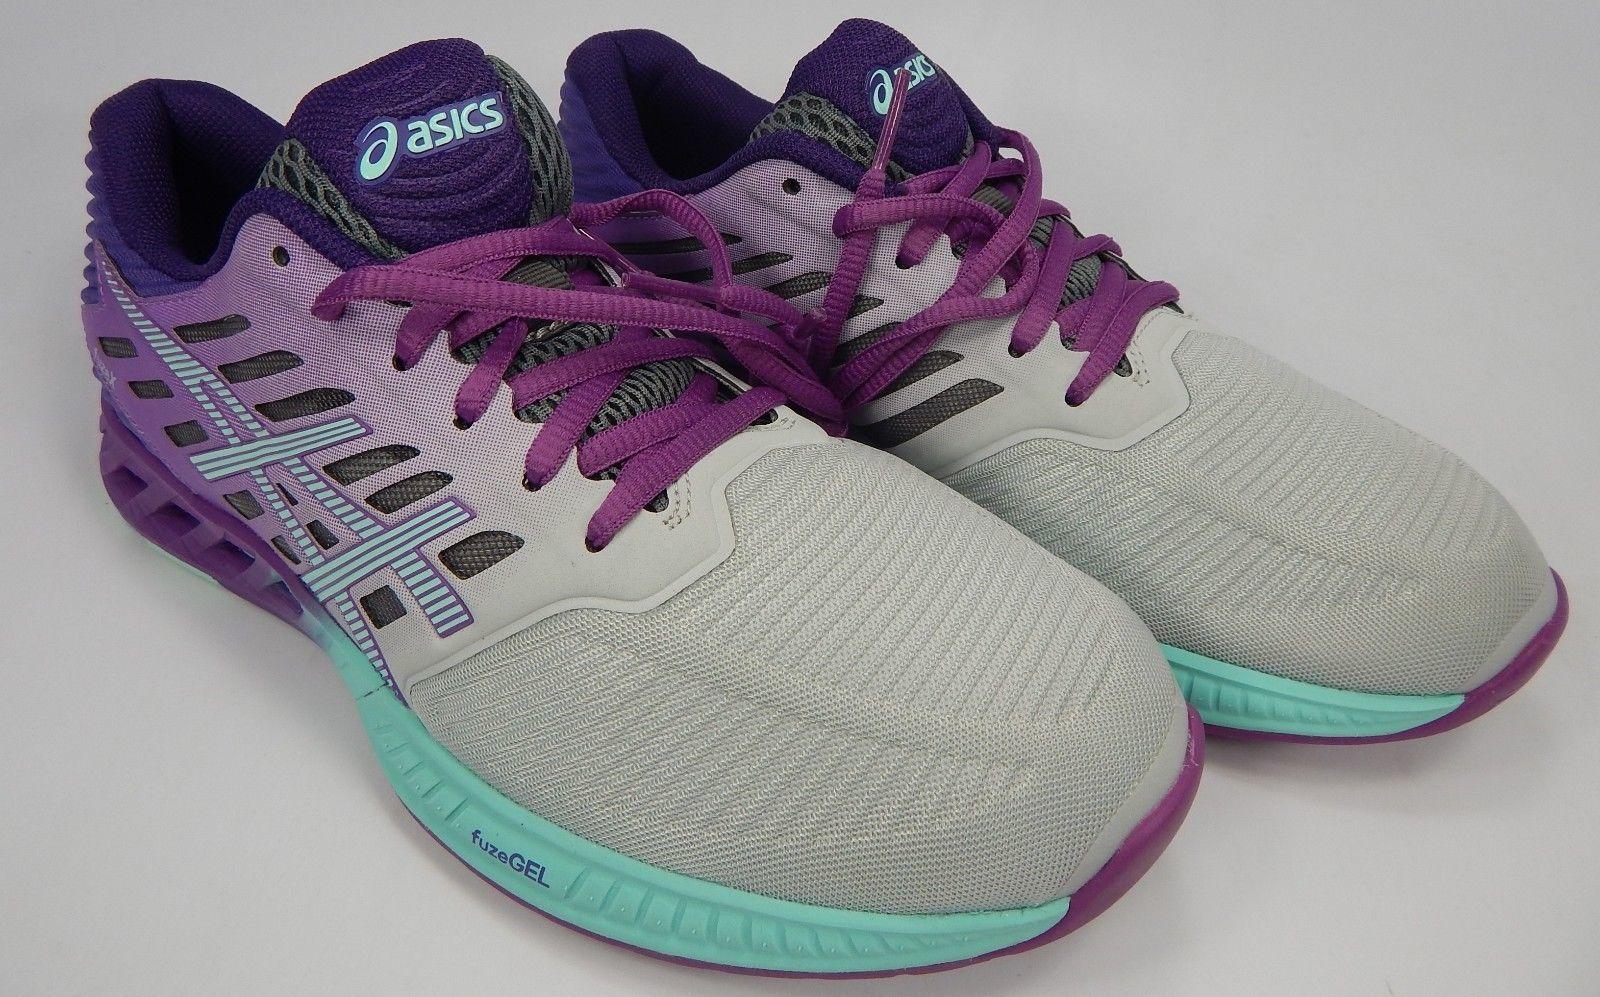 Asics Fuse X Size US 8 M (B) EU 39.5 Women's Running Shoes Gray Purple T689N